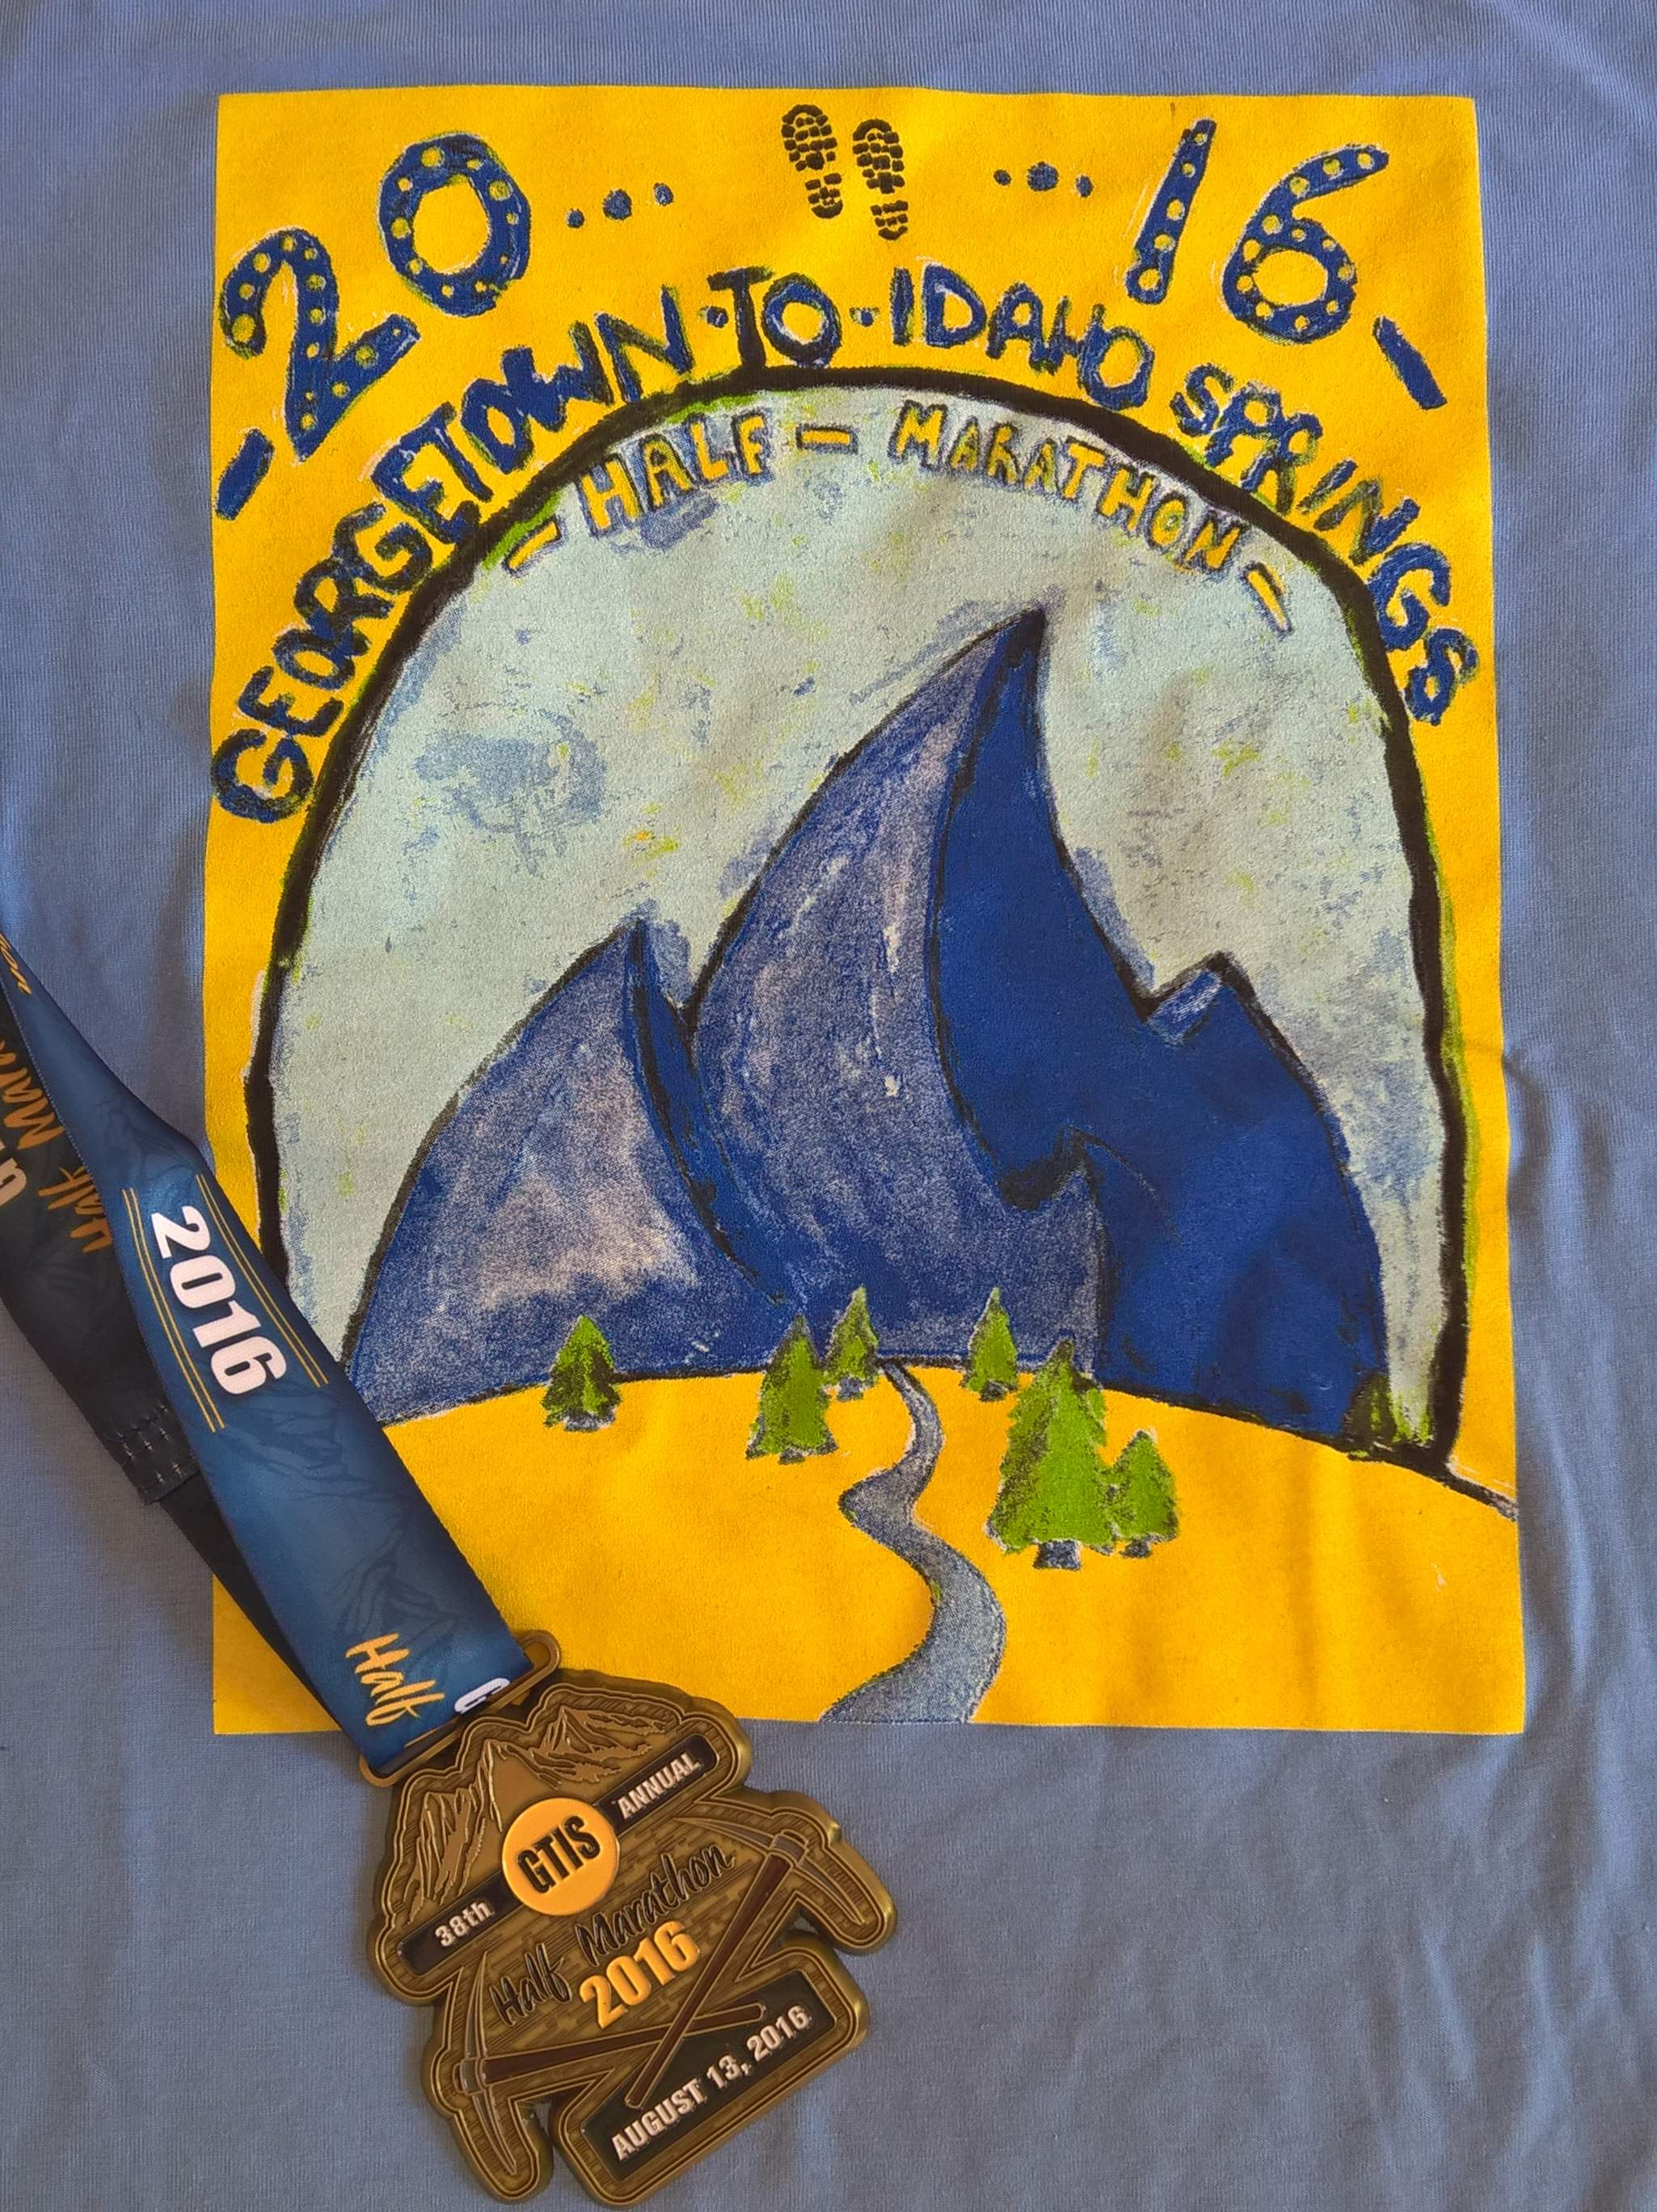 The 2016 Georgtown-Idaho Springs Half Marathon t-shirt and medal.